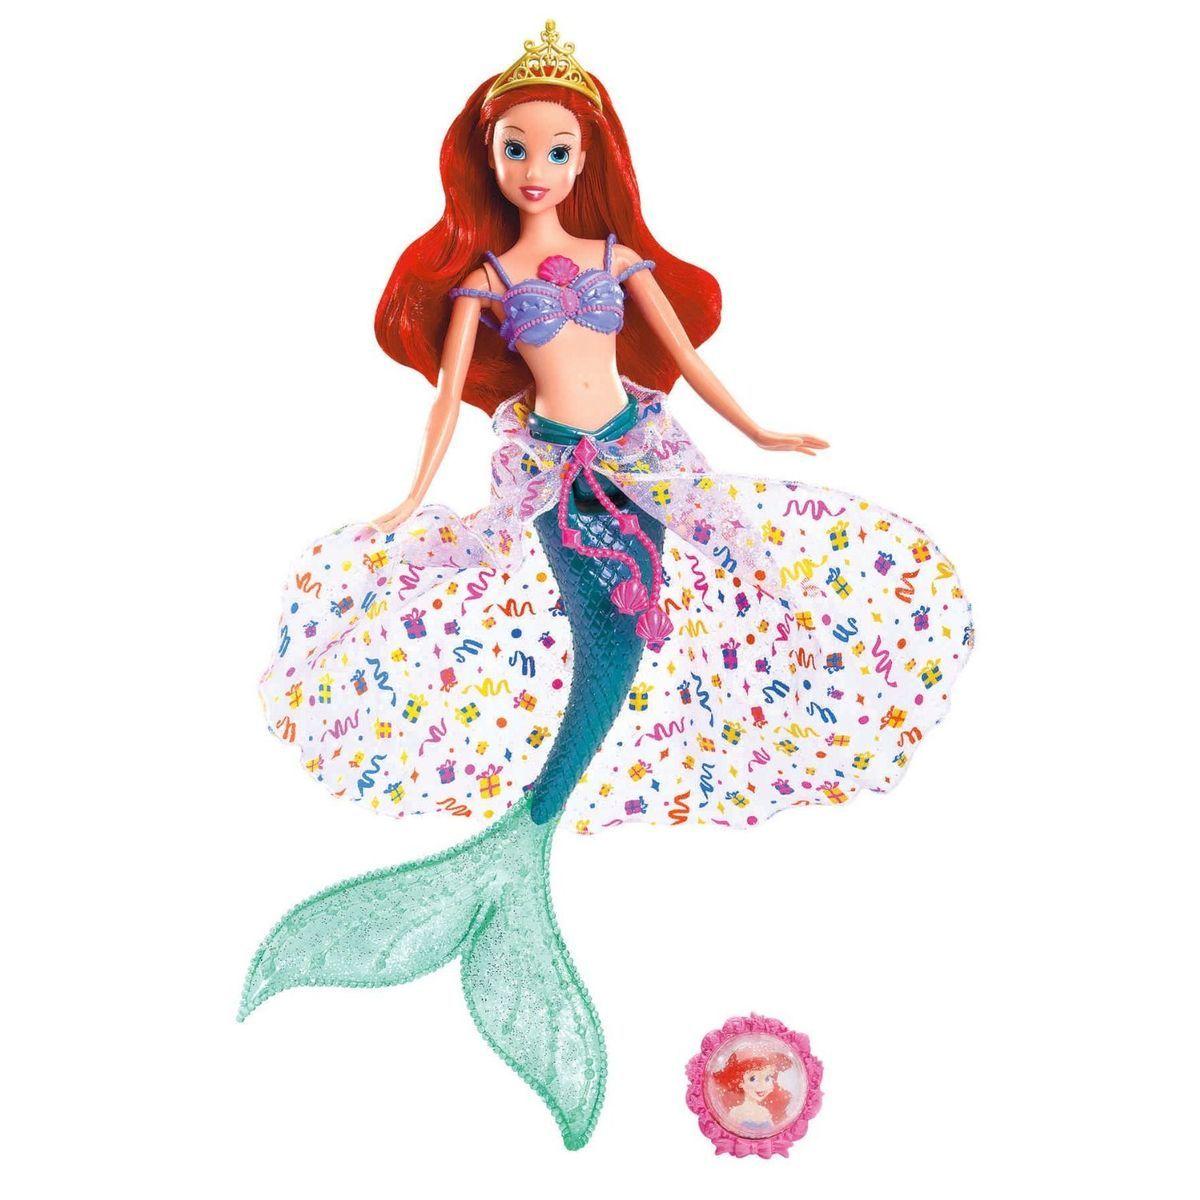 Disney Princess Ariel Birthday Wishes Doll NEW in package Sings